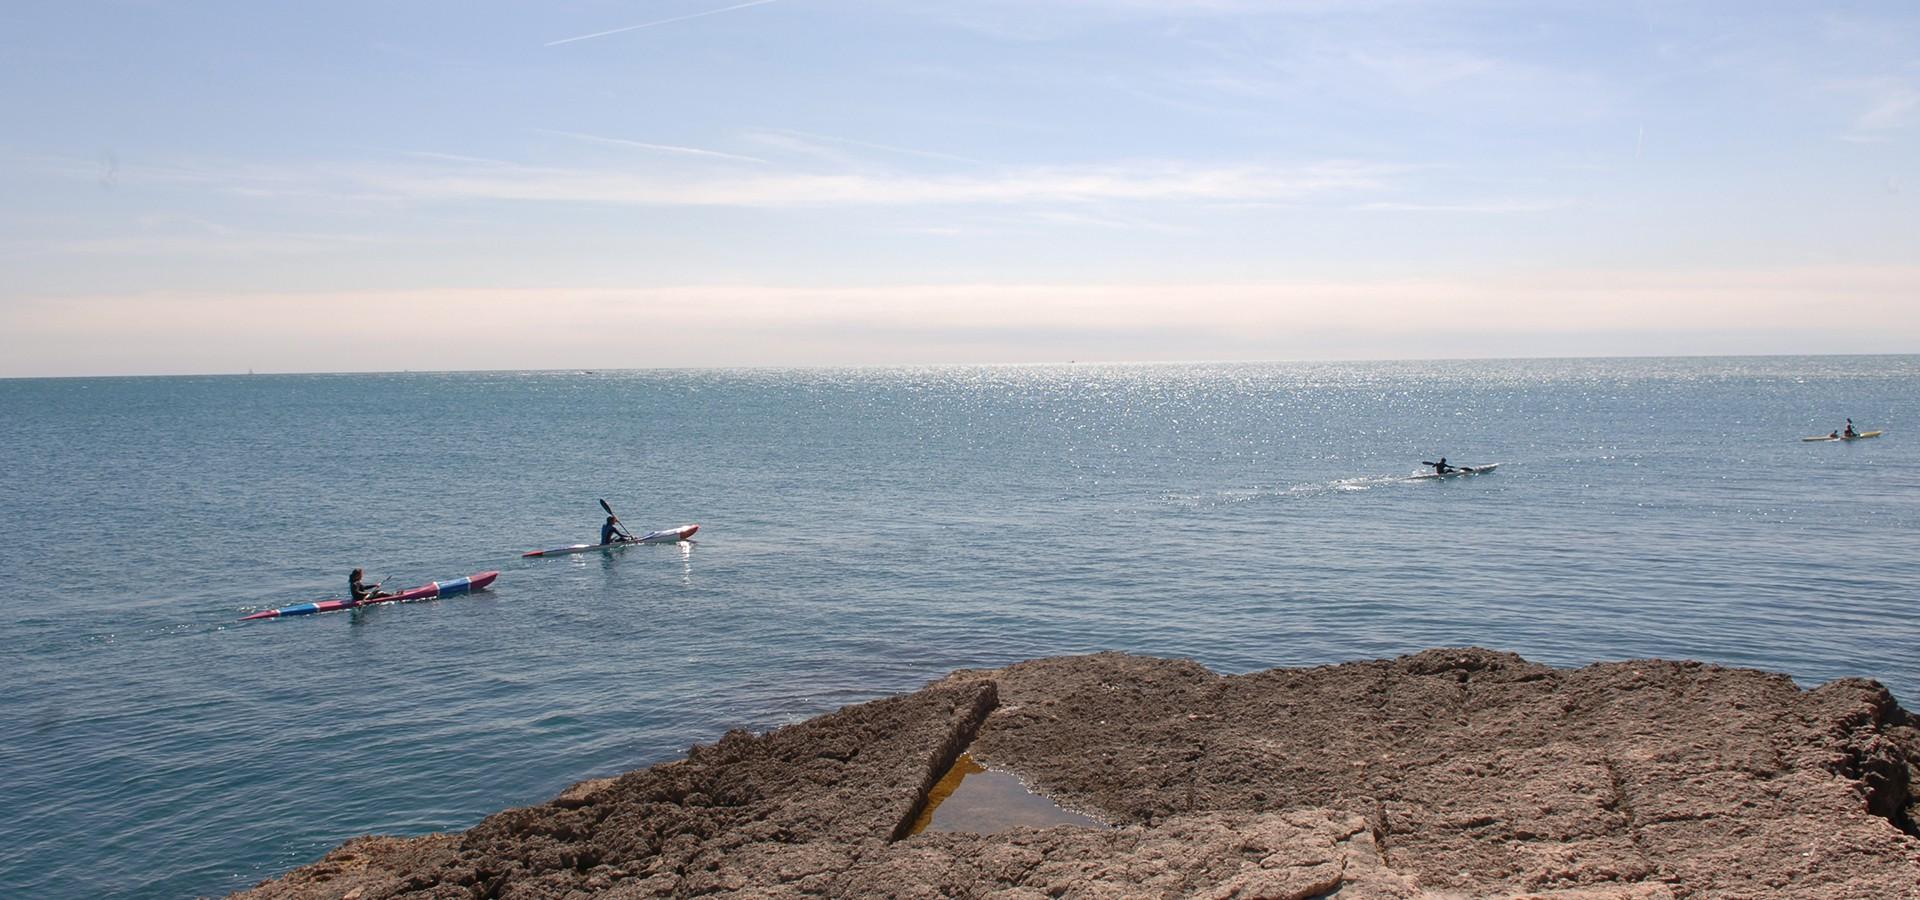 Les activités nautiques à Martigues